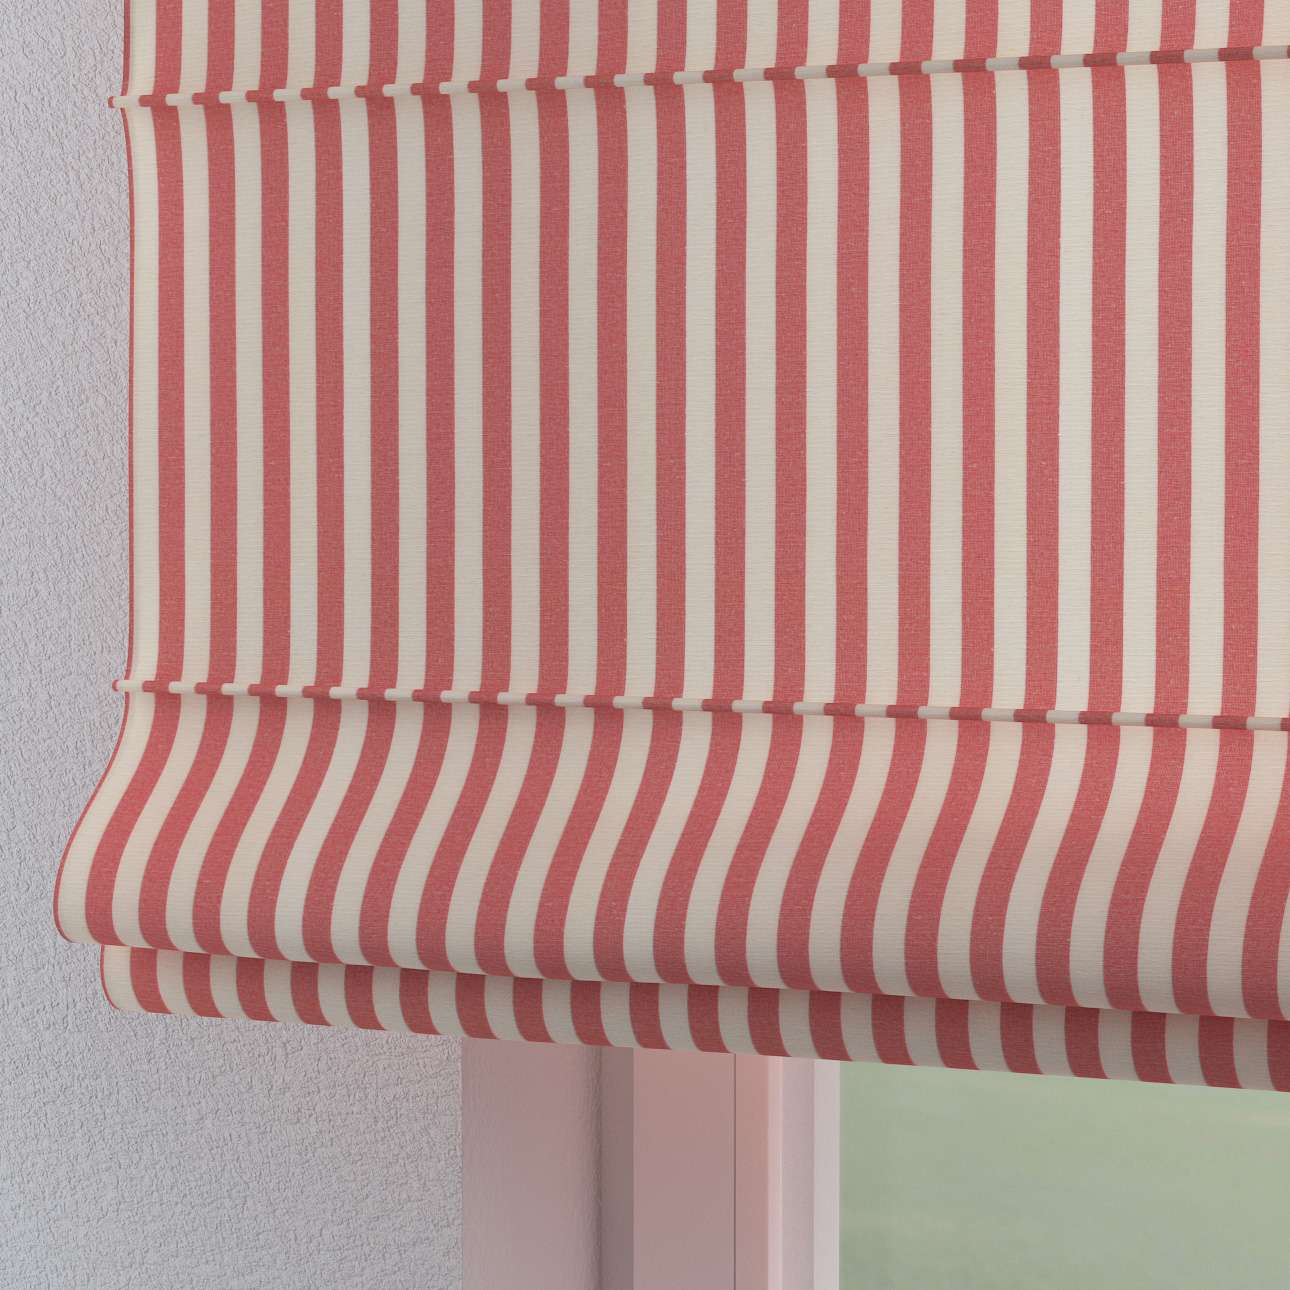 Rímska roleta Torino V kolekcii Quadro, tkanina: 136-17